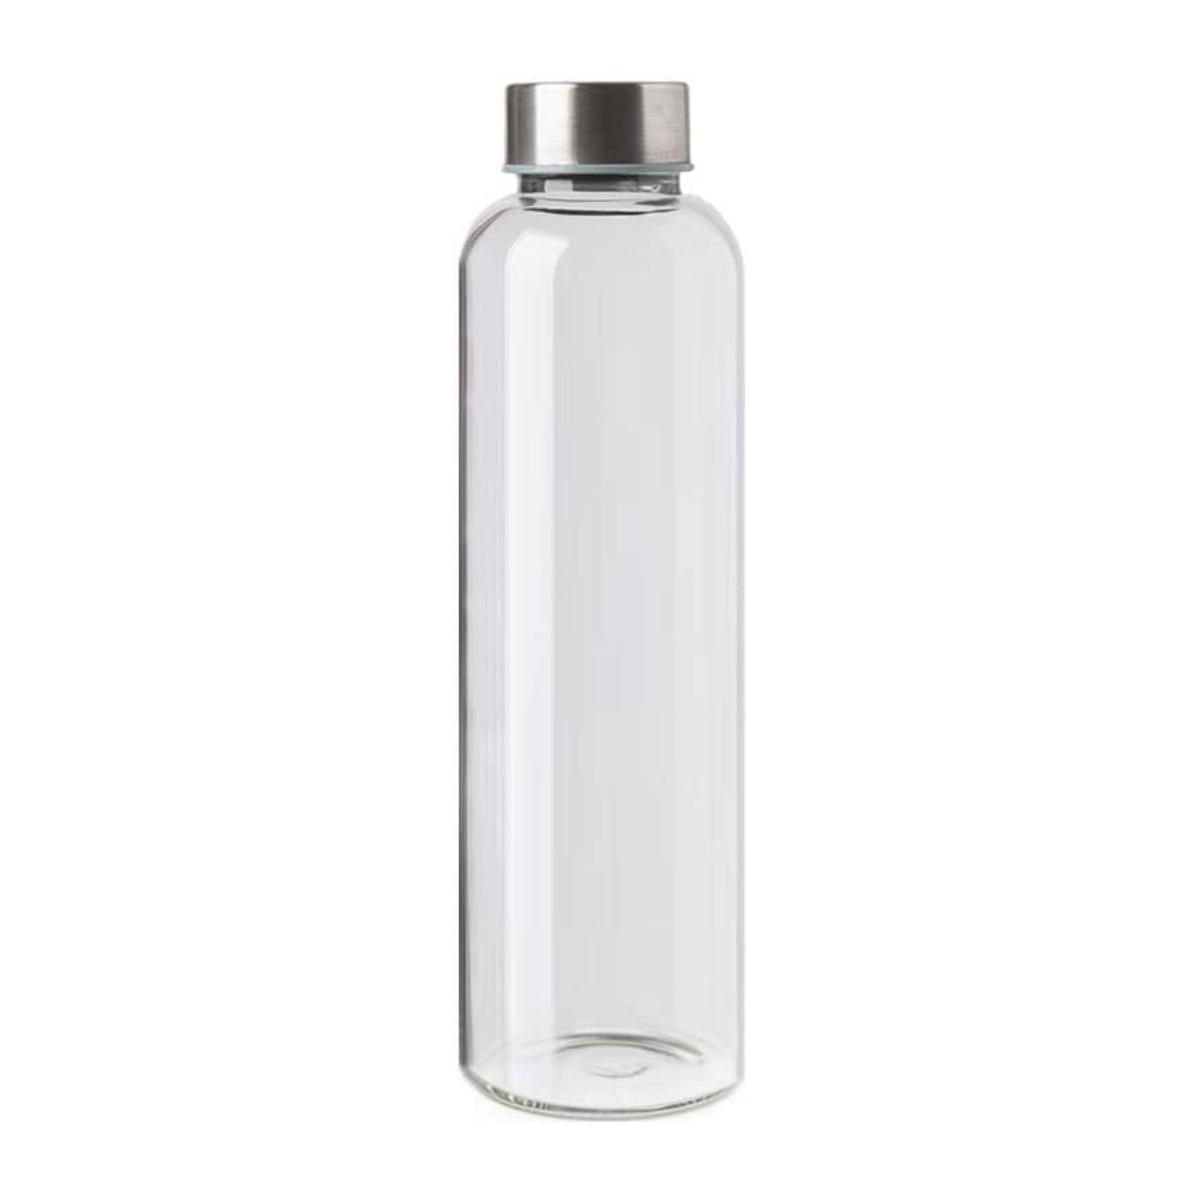 Garrafa Perfect Water Cinza 500ml - Pacco  - KFit Nutrition